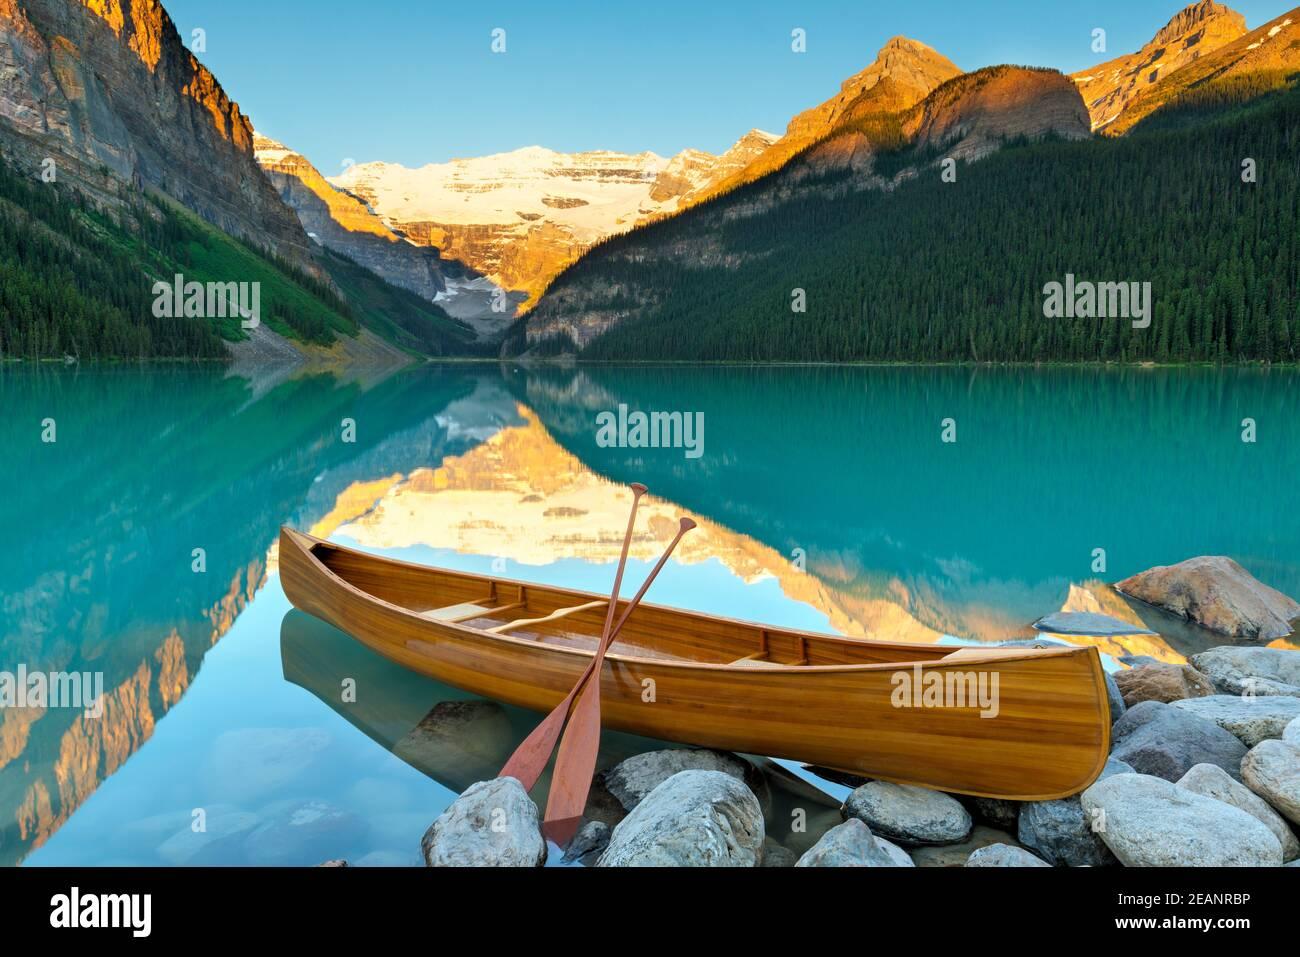 Cedar-Strip Canoe at Lake Louise, Banff National Park, UNESCO World Heritage Site, Alberta, Canadian Rockies, Canada, North America Stock Photo